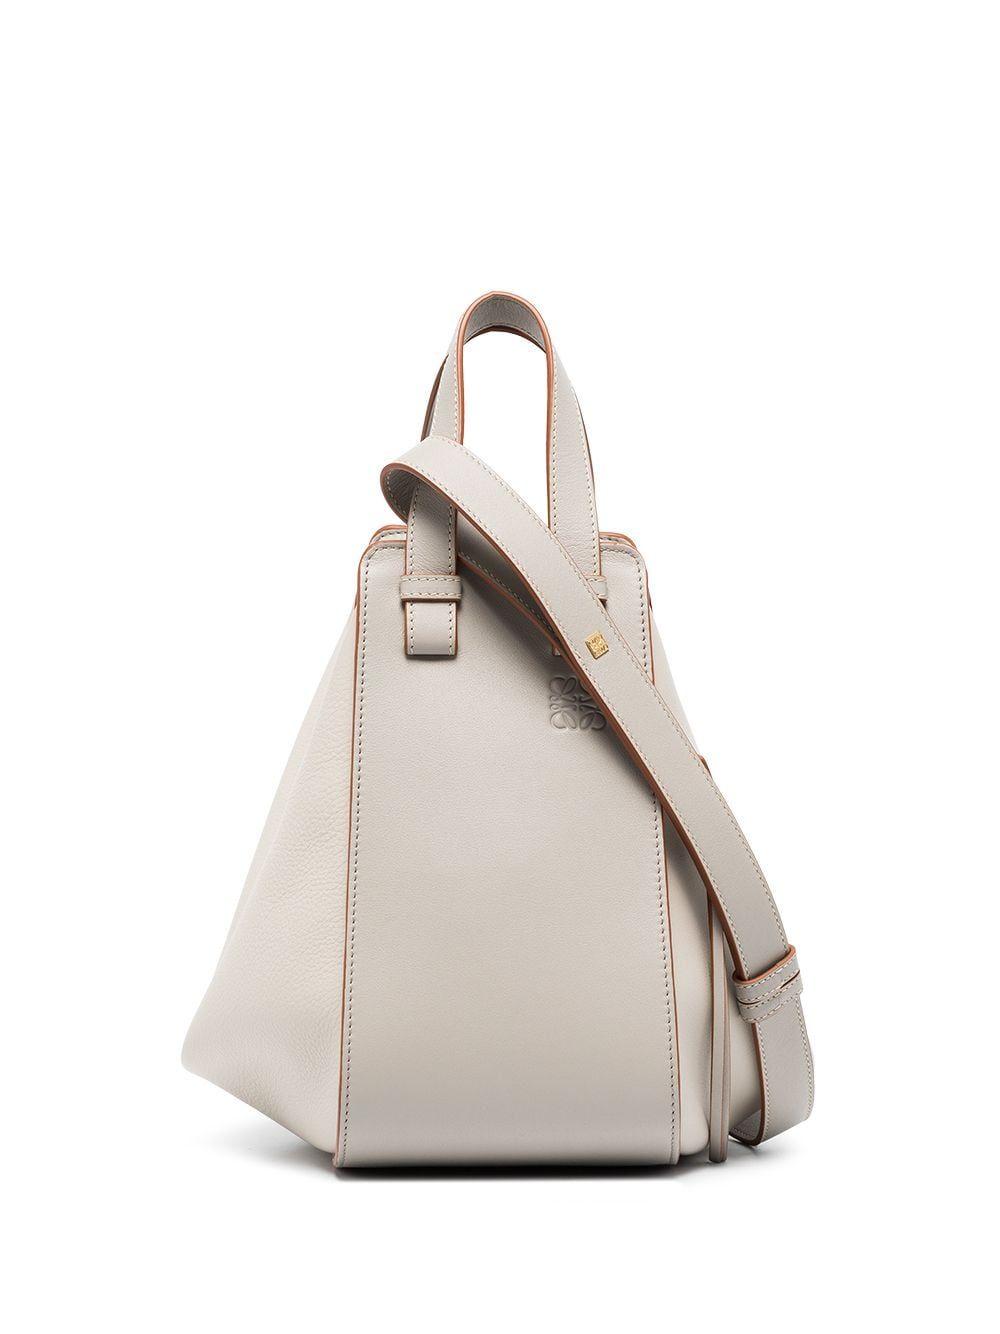 Hammock small leather handbag